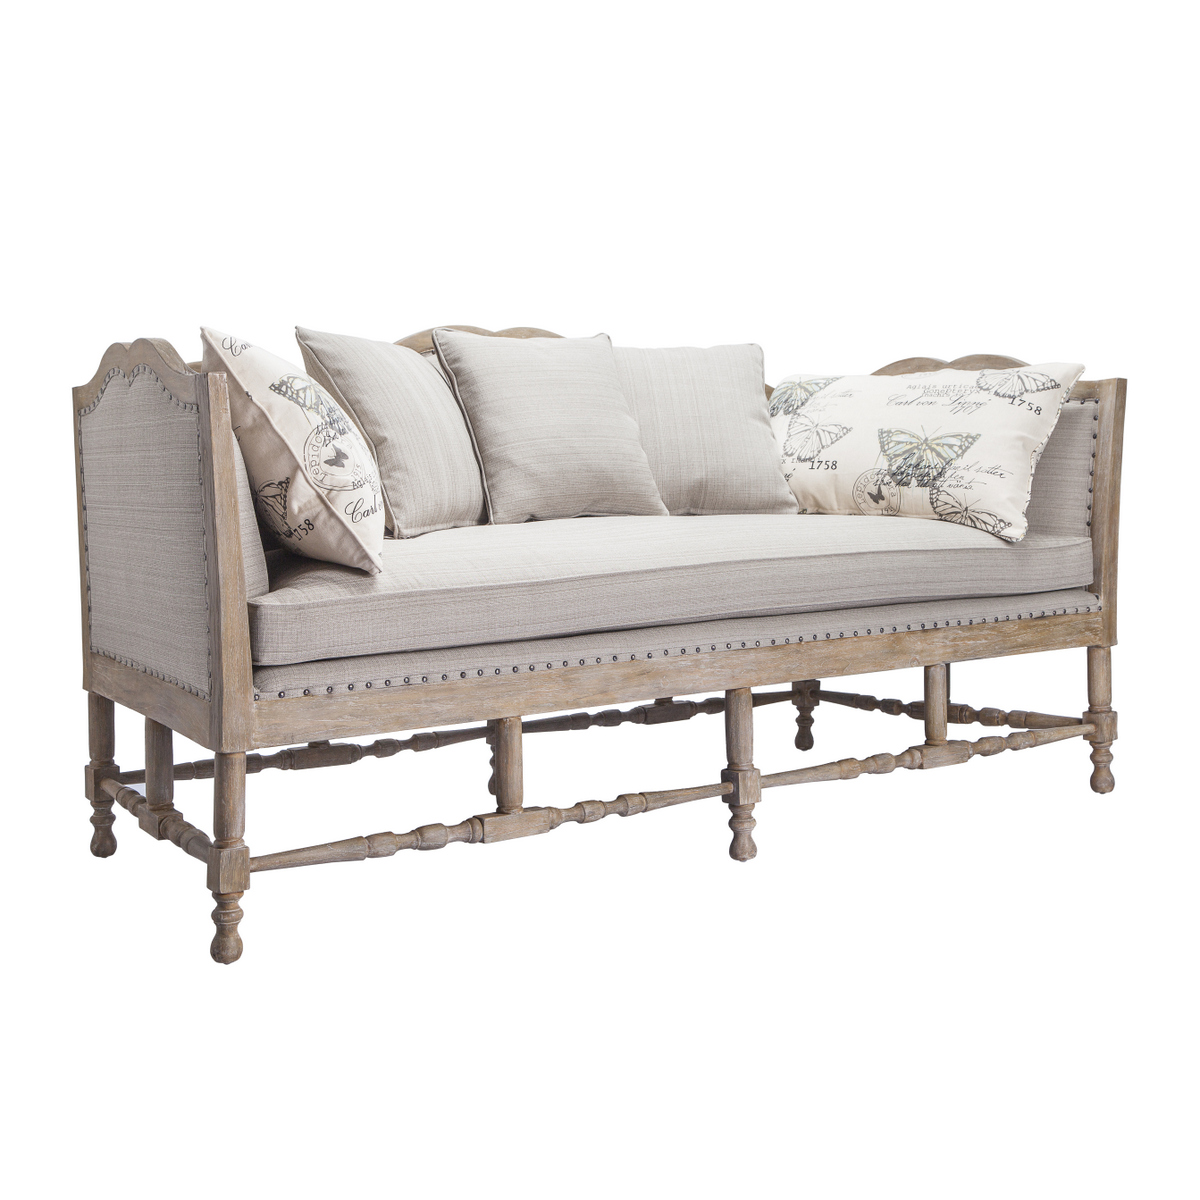 pomona sofa futons and beds lady scott jones thesofa